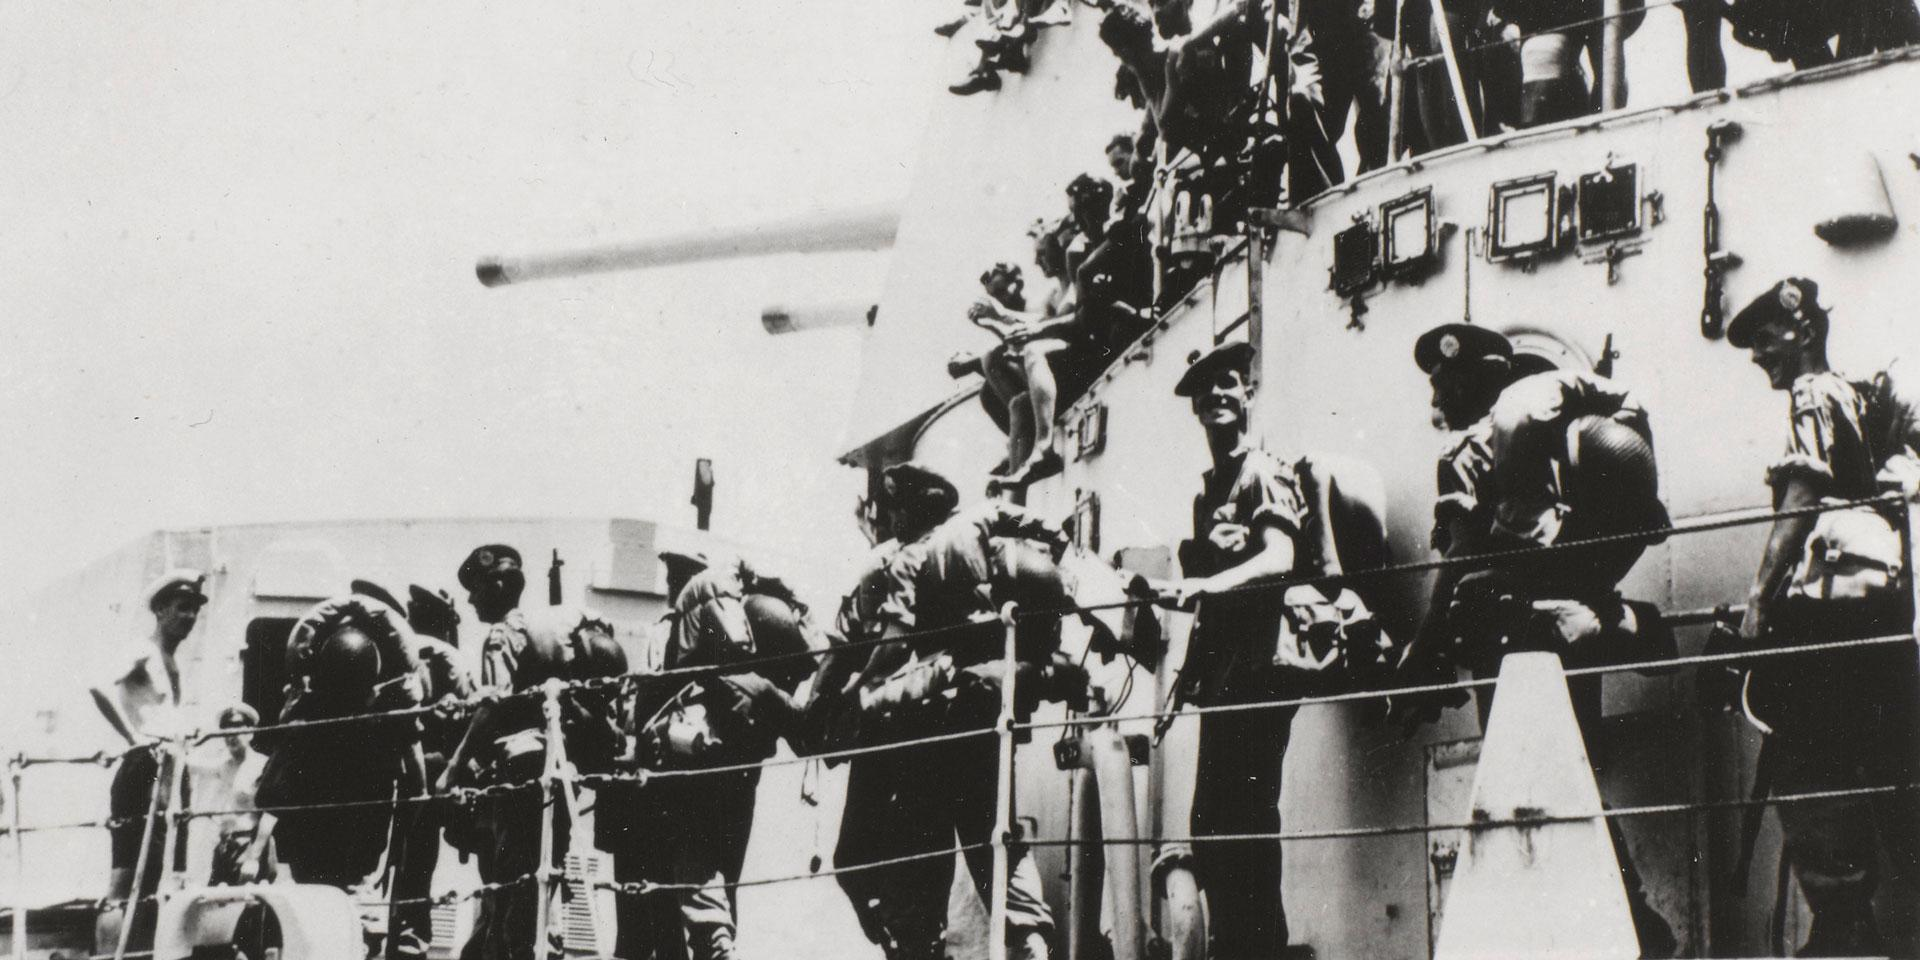 1st Battalion The Argyll and Sutherland Highlanders (Princess Louise's) boarding HMS 'Ceylon', Hong Kong, 1950